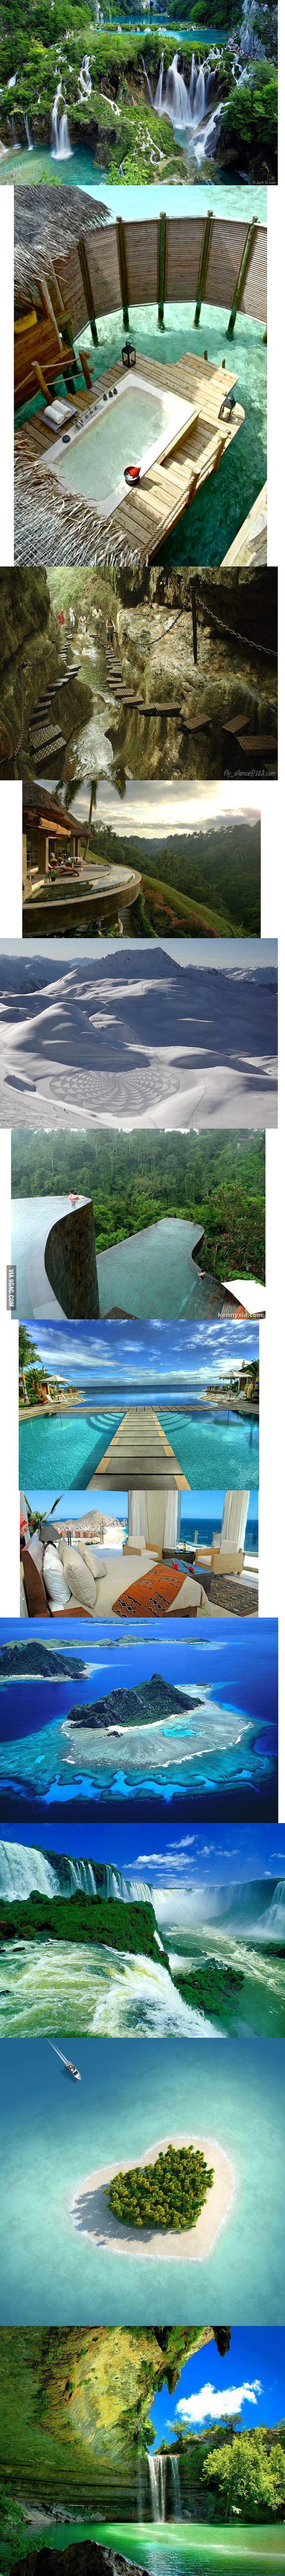 Amazing semi-natural places